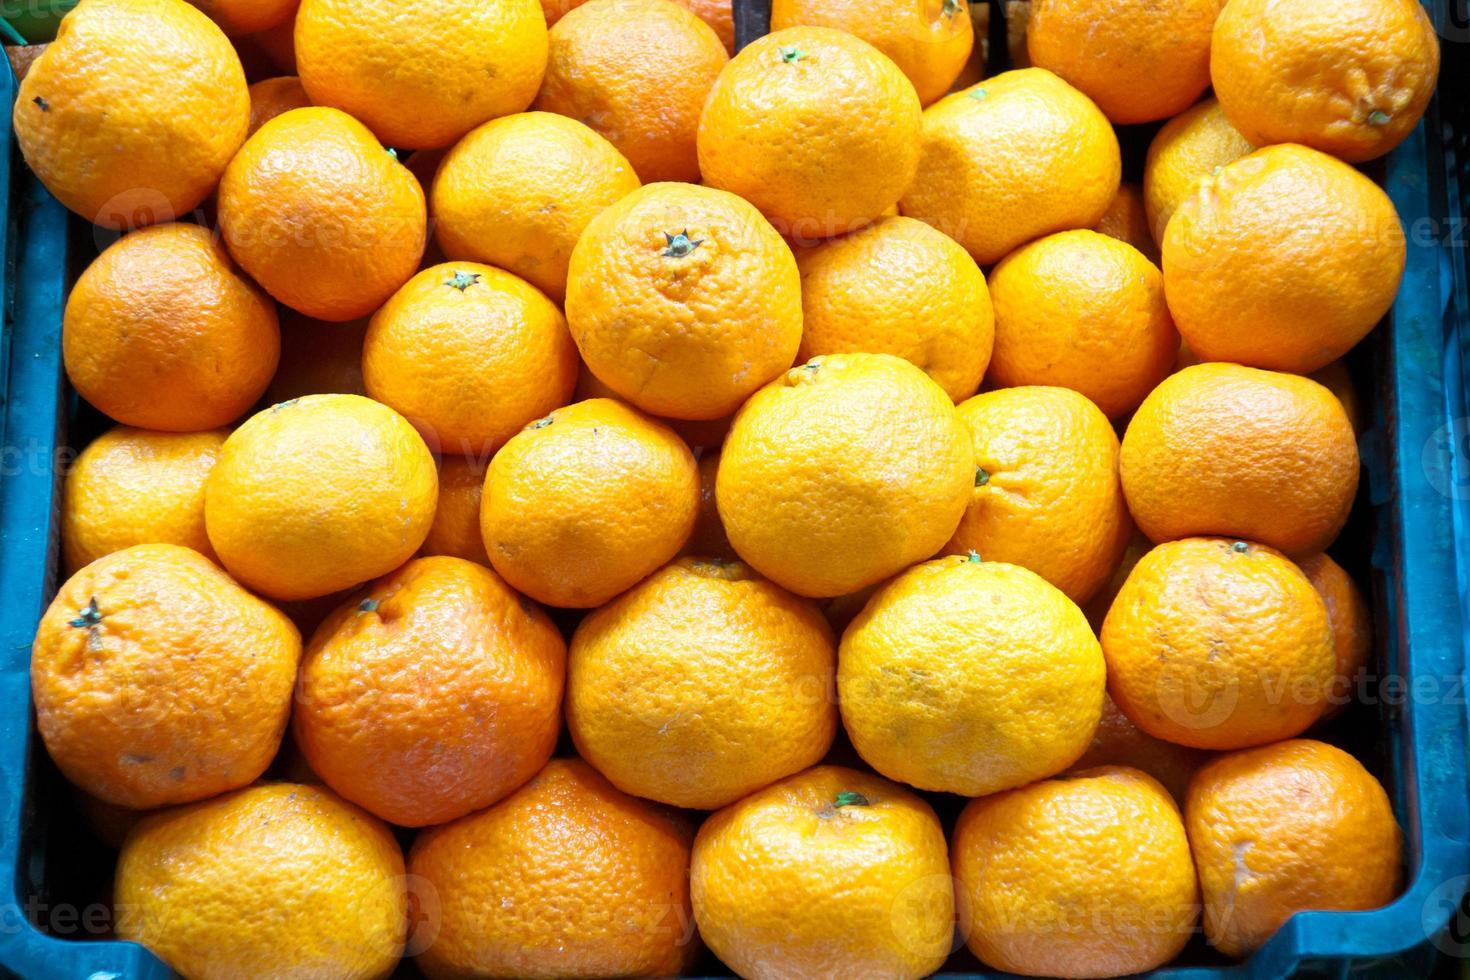 apelsiner på en marknad foto